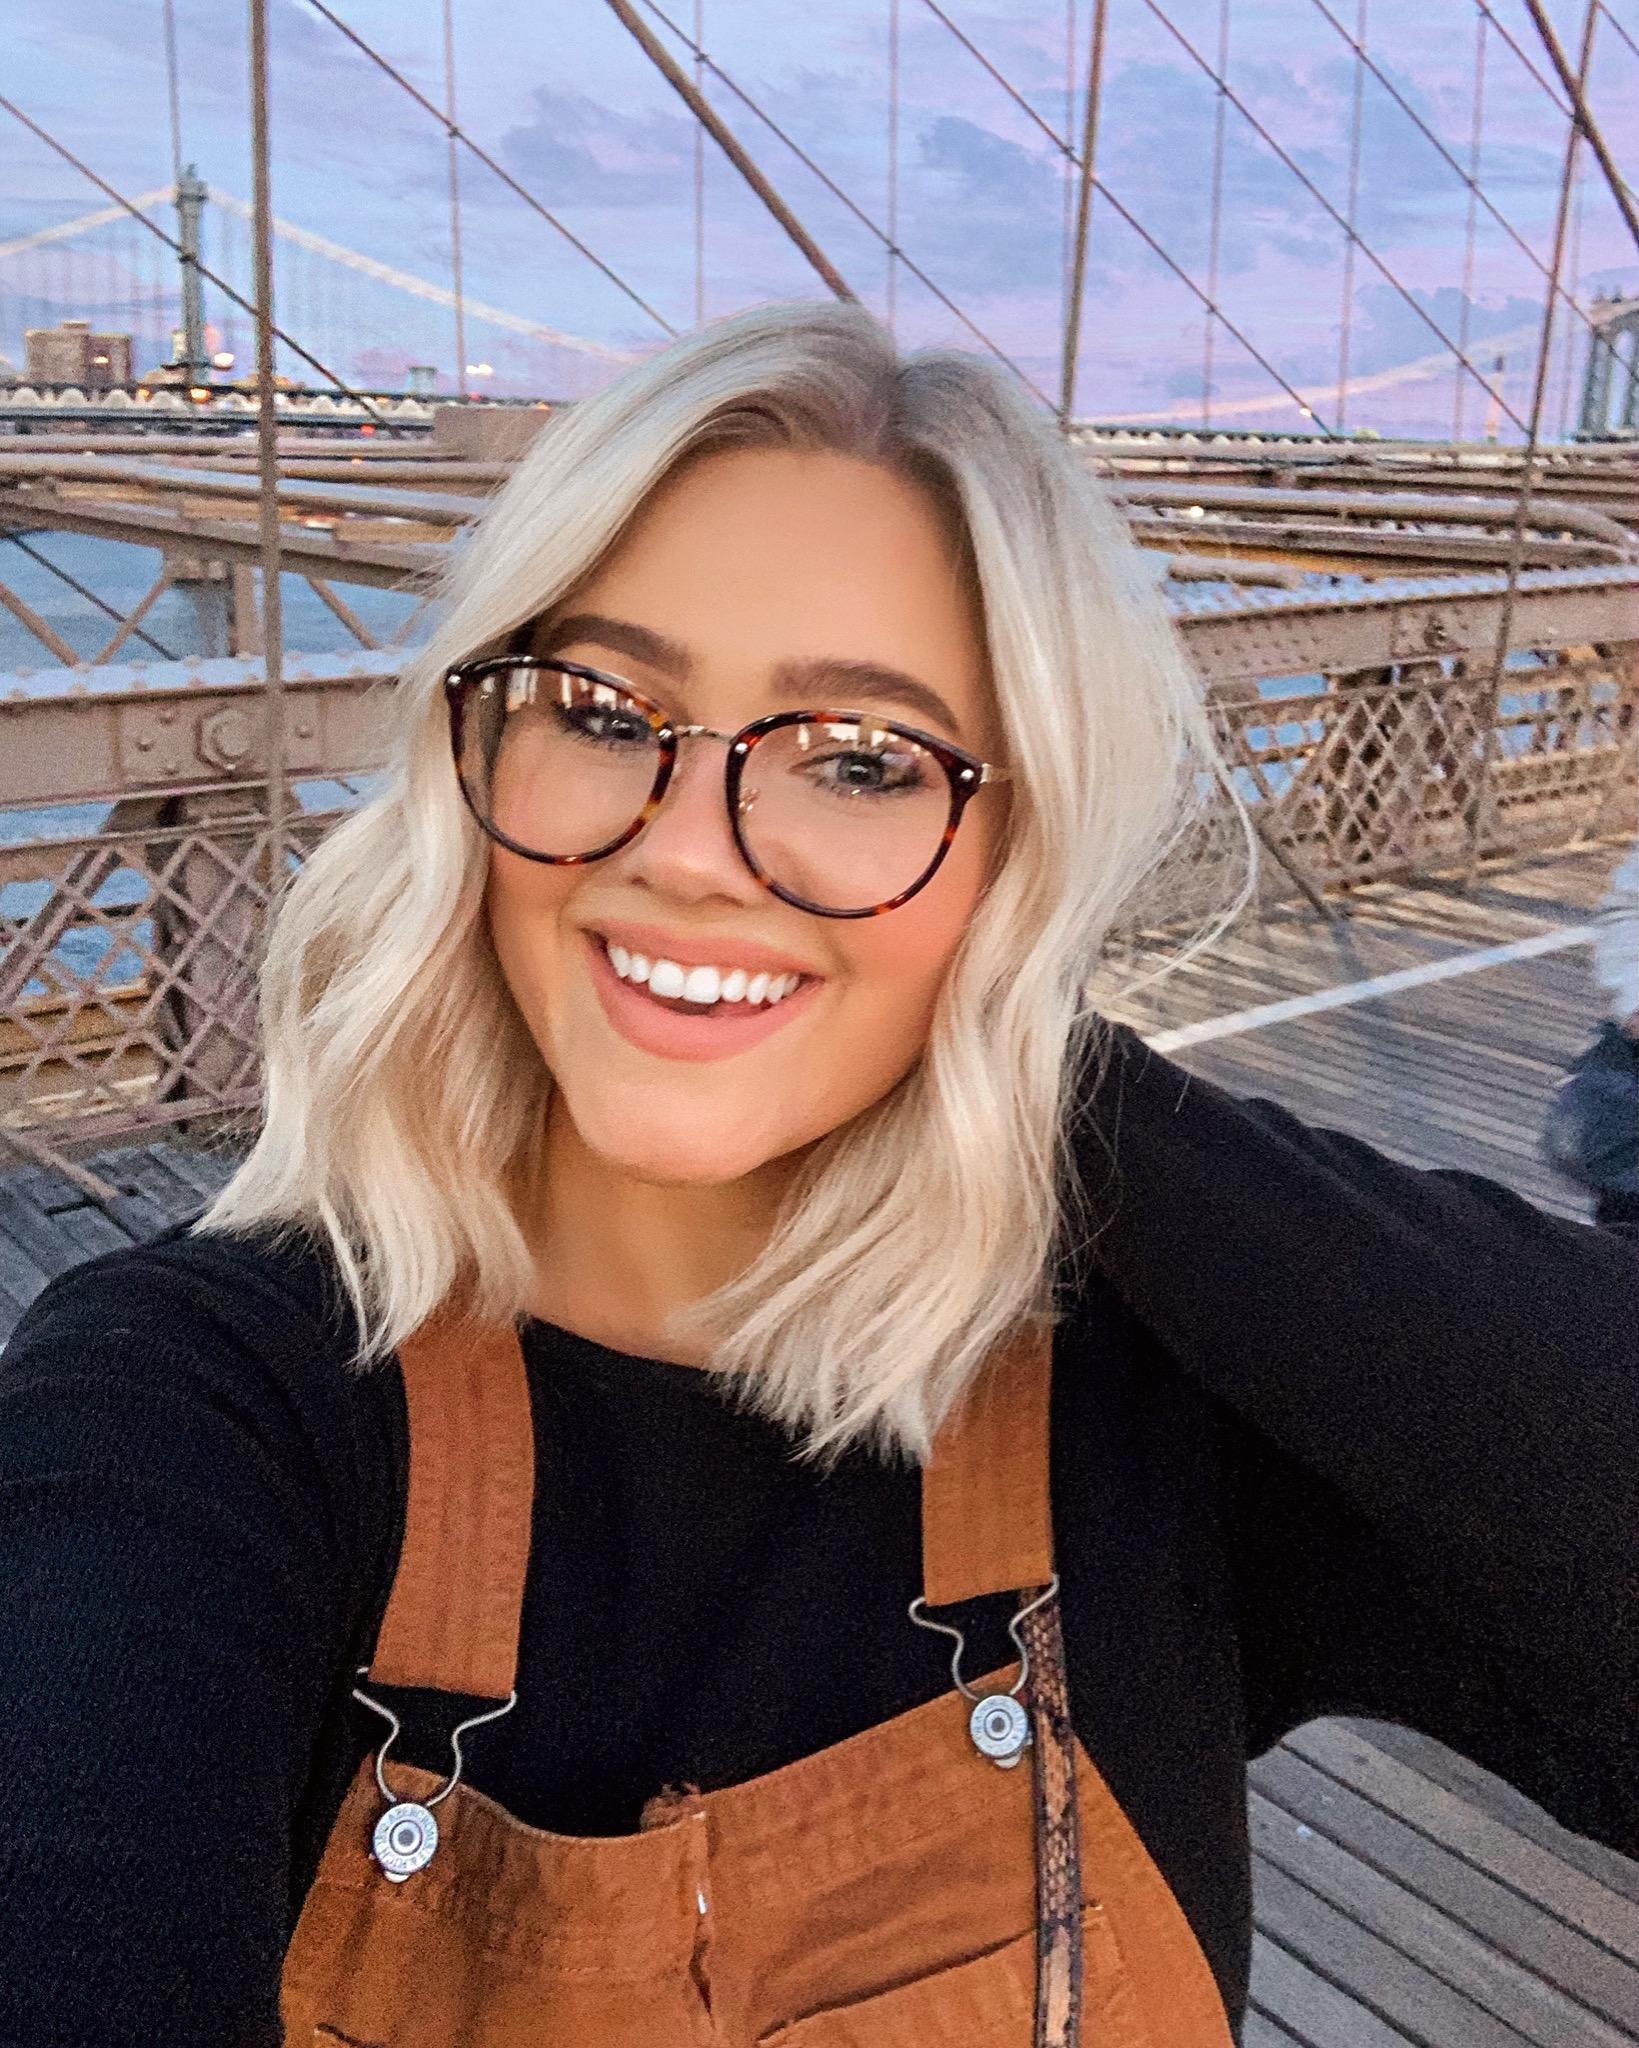 Brooklyn Bridge Selfie / Short Hair Goals / Glasses - Bre Sheppard